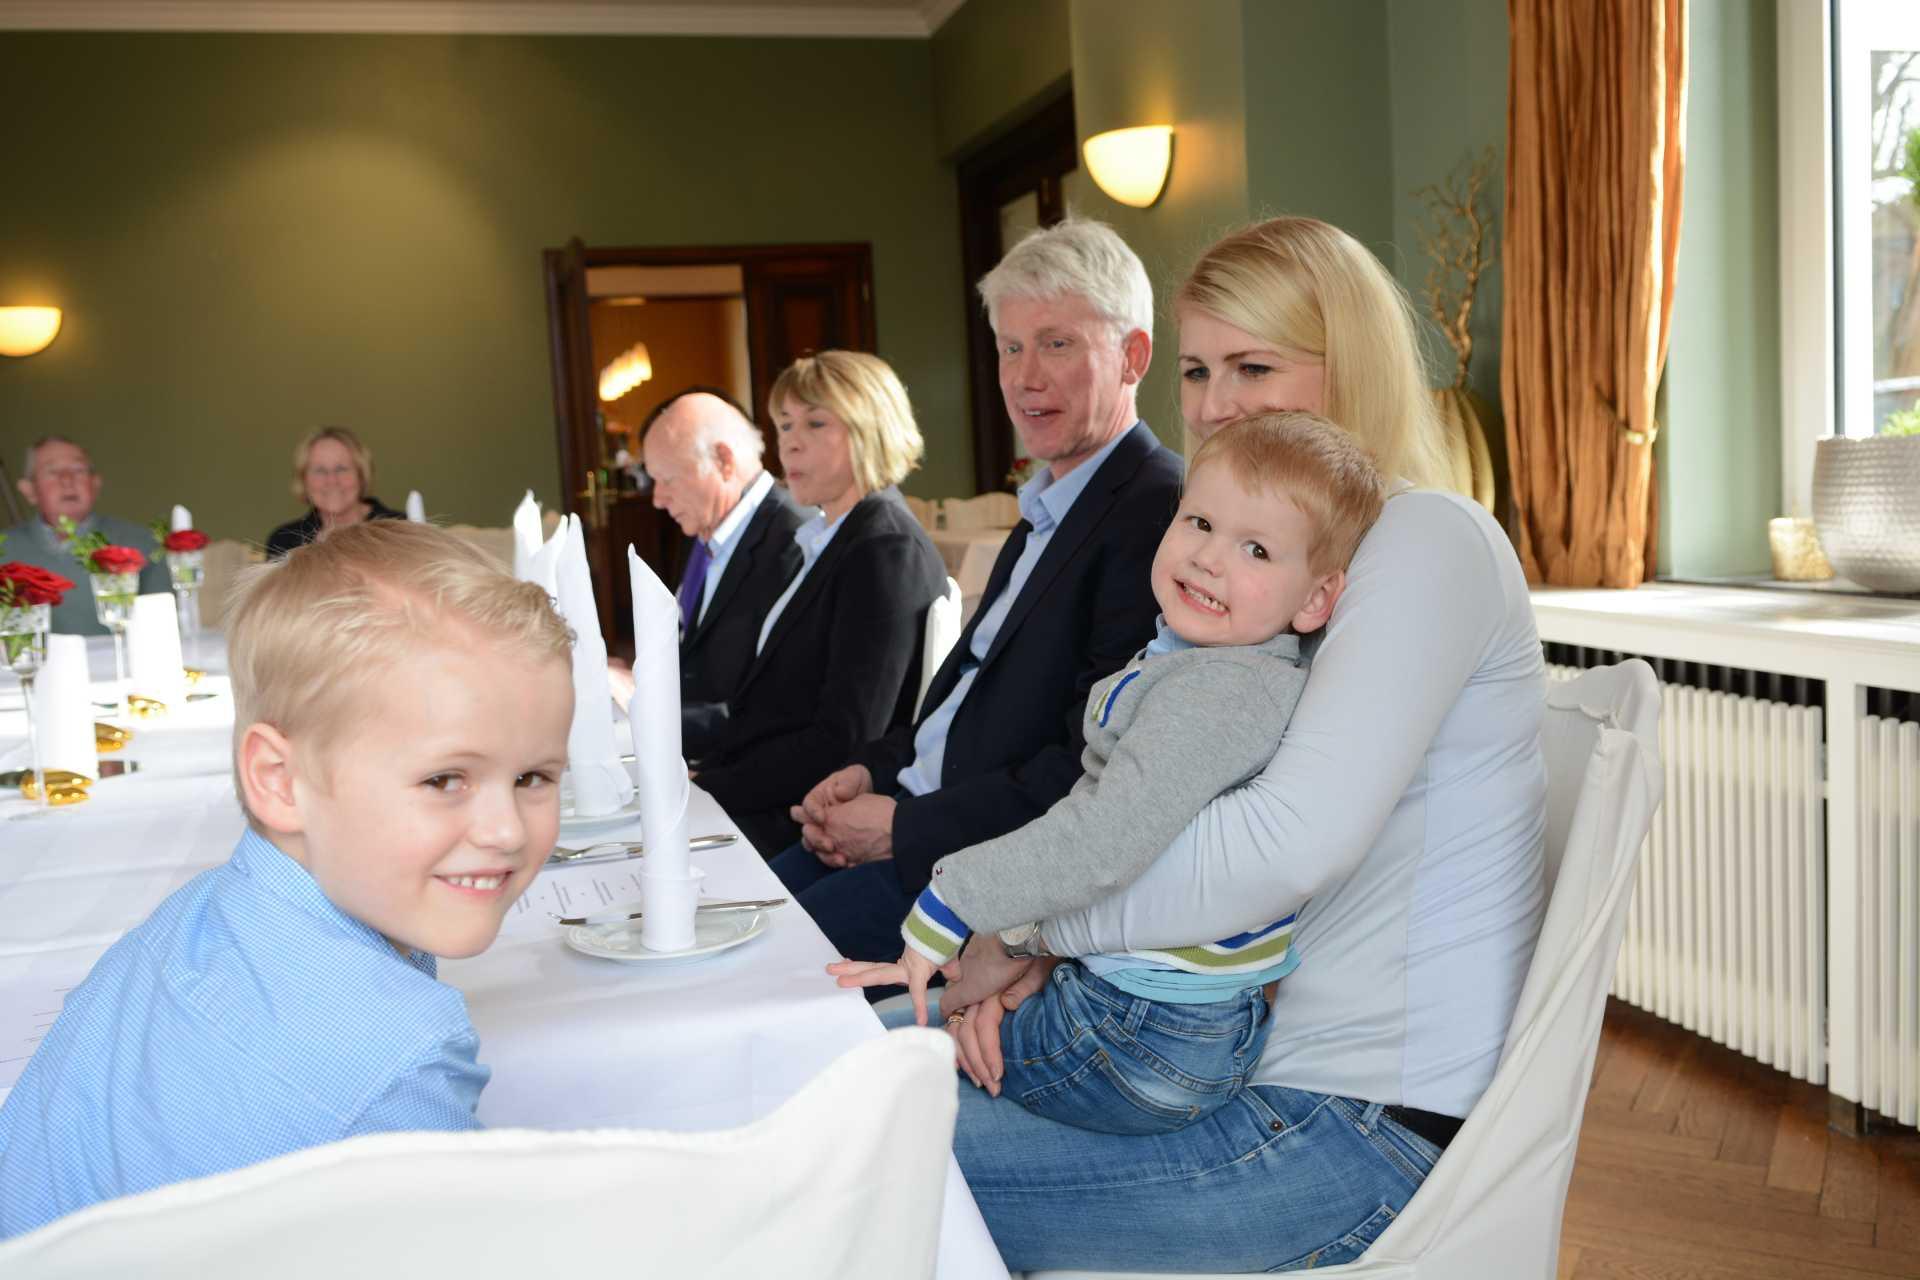 Familienfeier im Restaurant Beesten